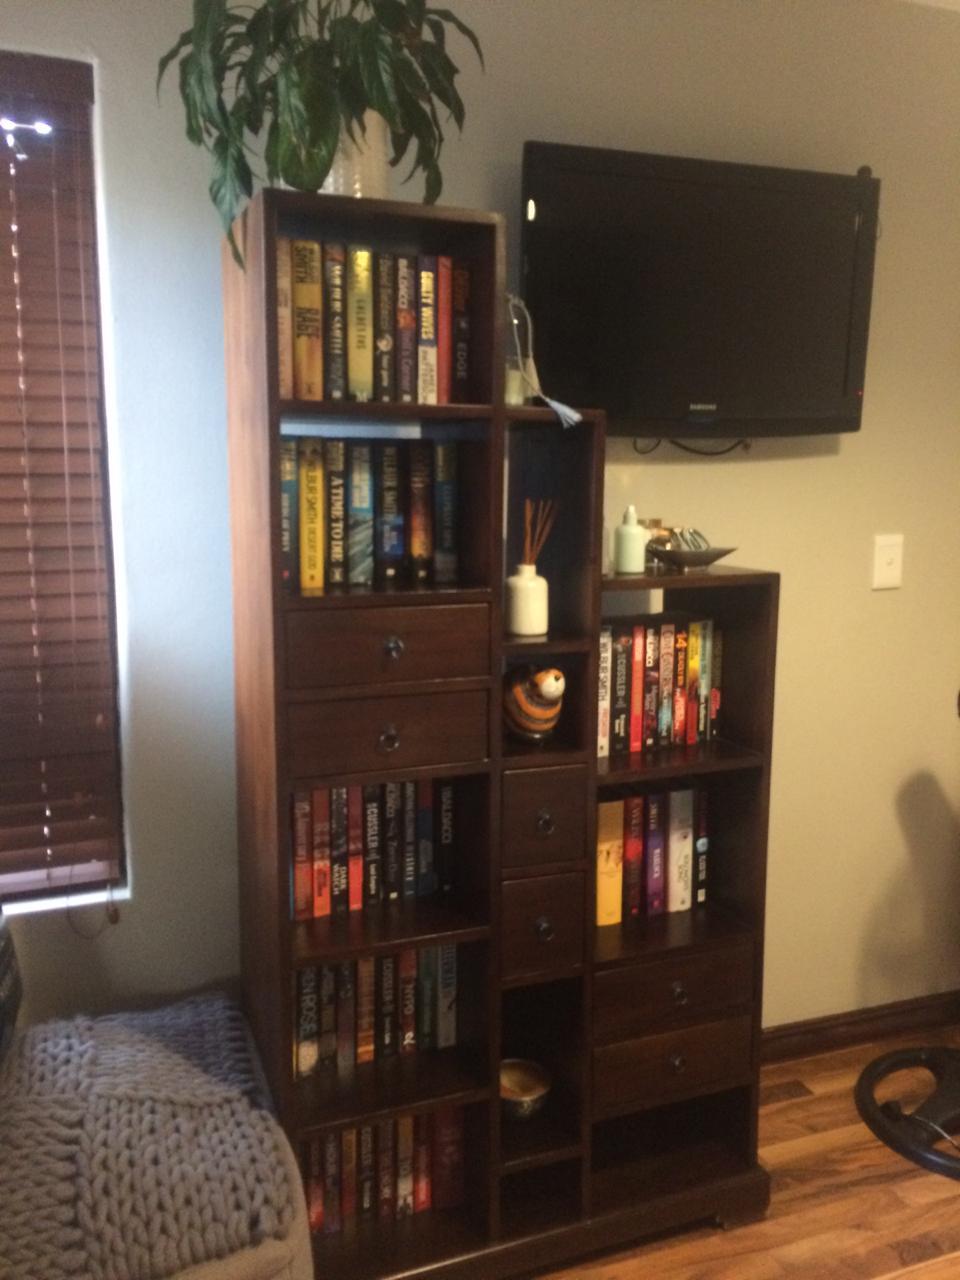 Book/Display Shelf - solid wood